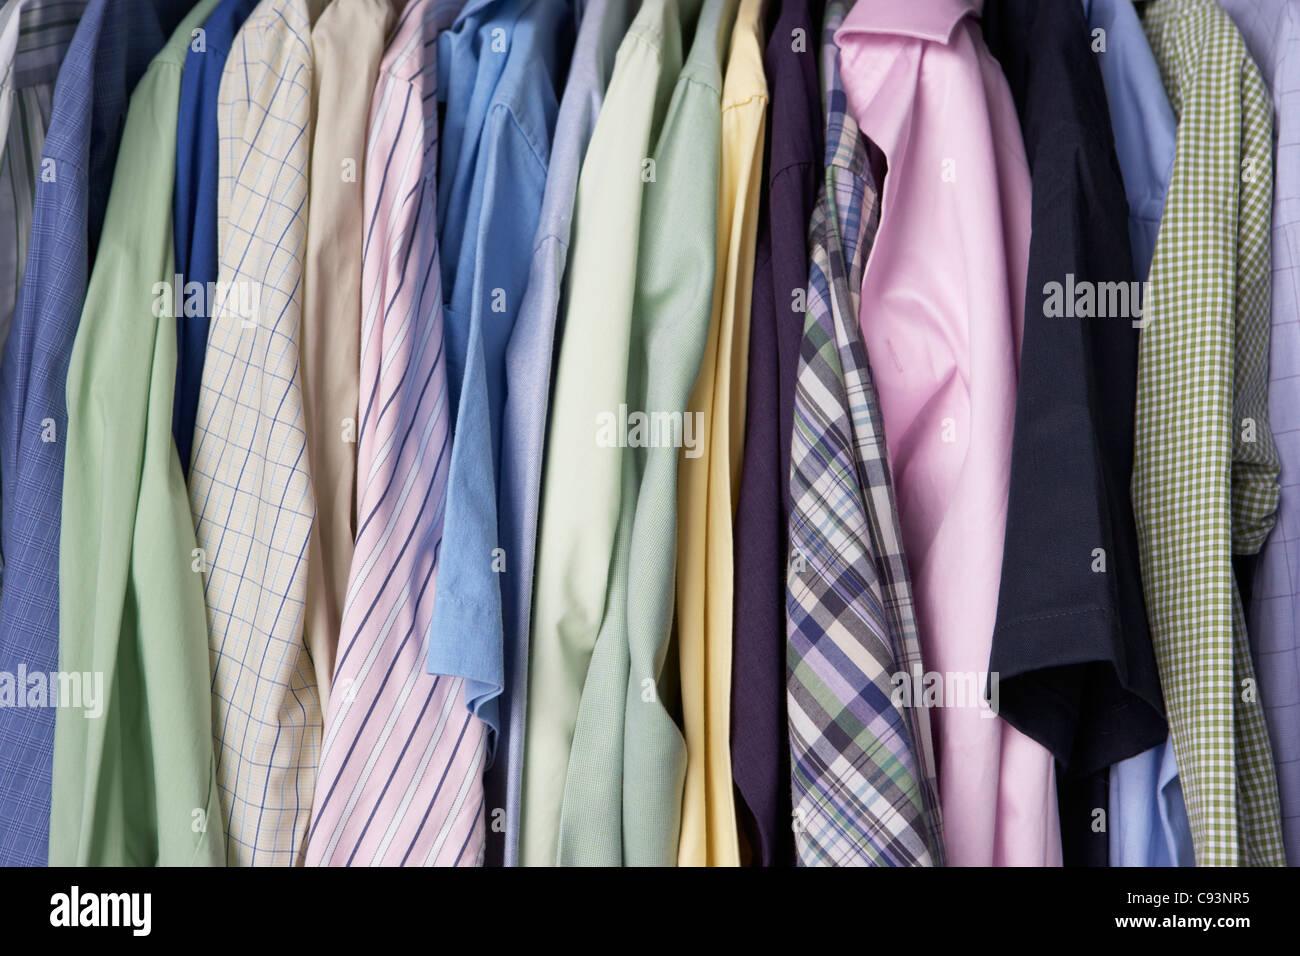 Rail of men's shirts - Stock Image